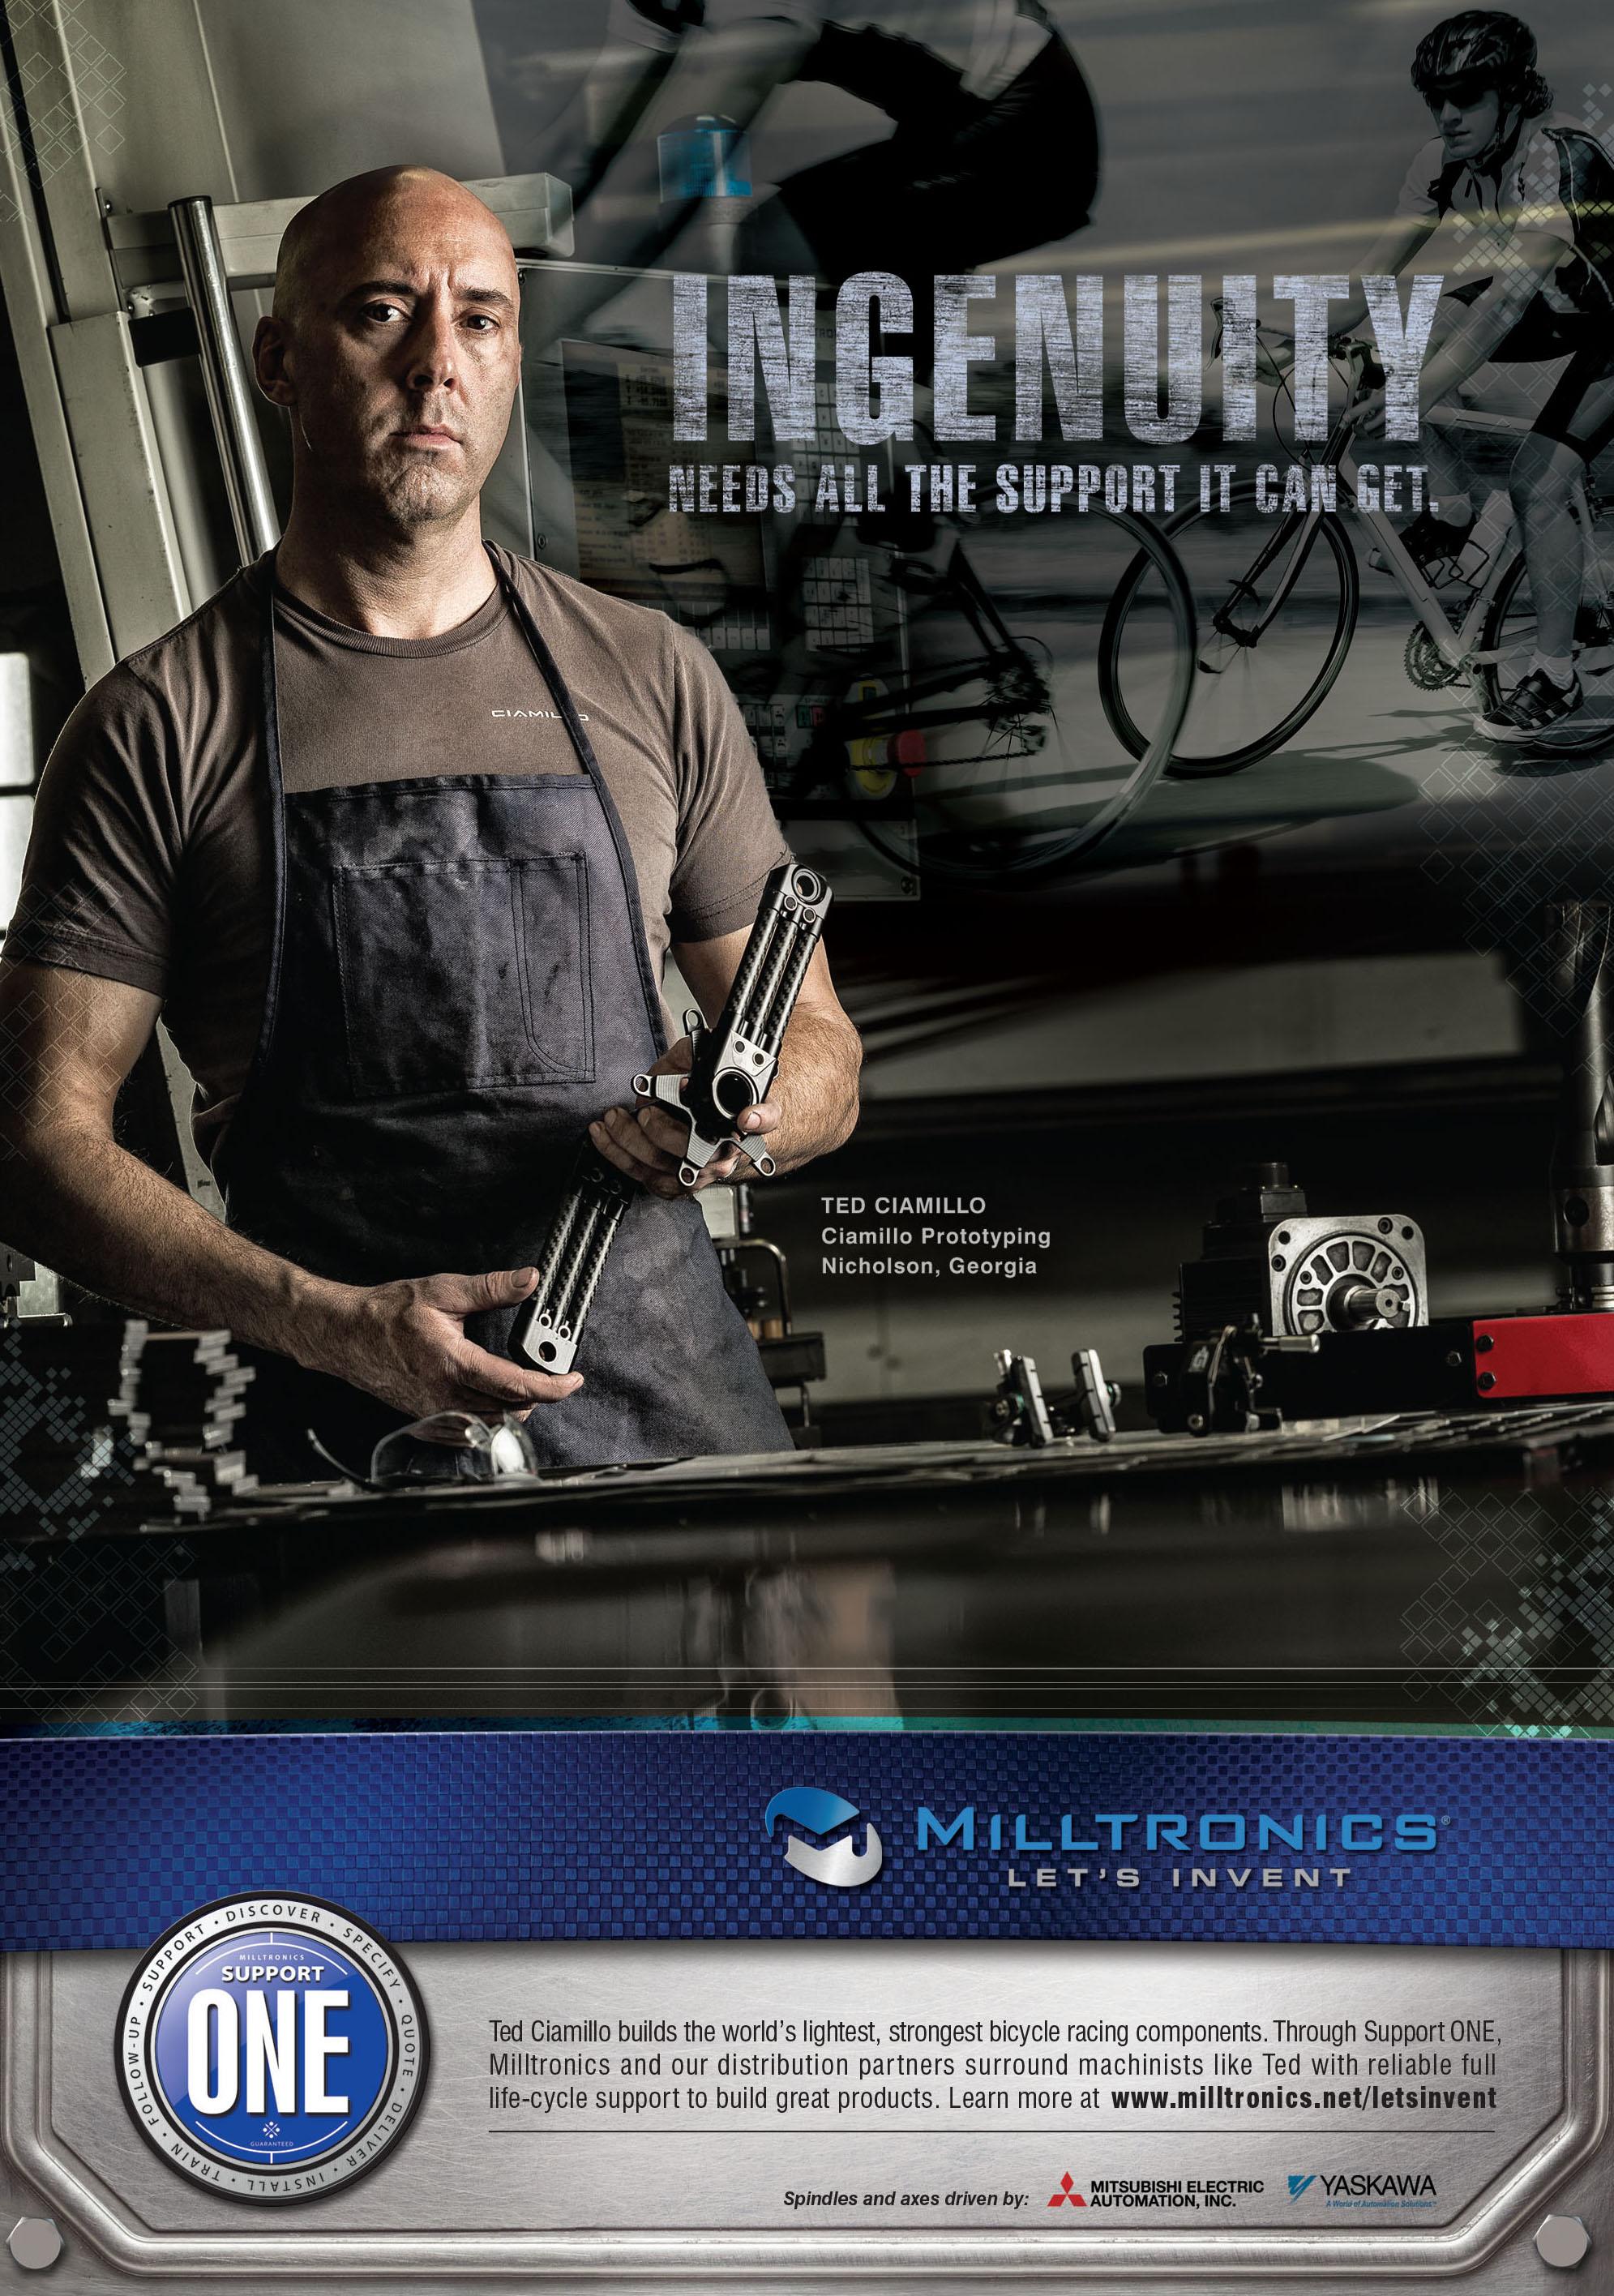 Milltronics CNC Machines